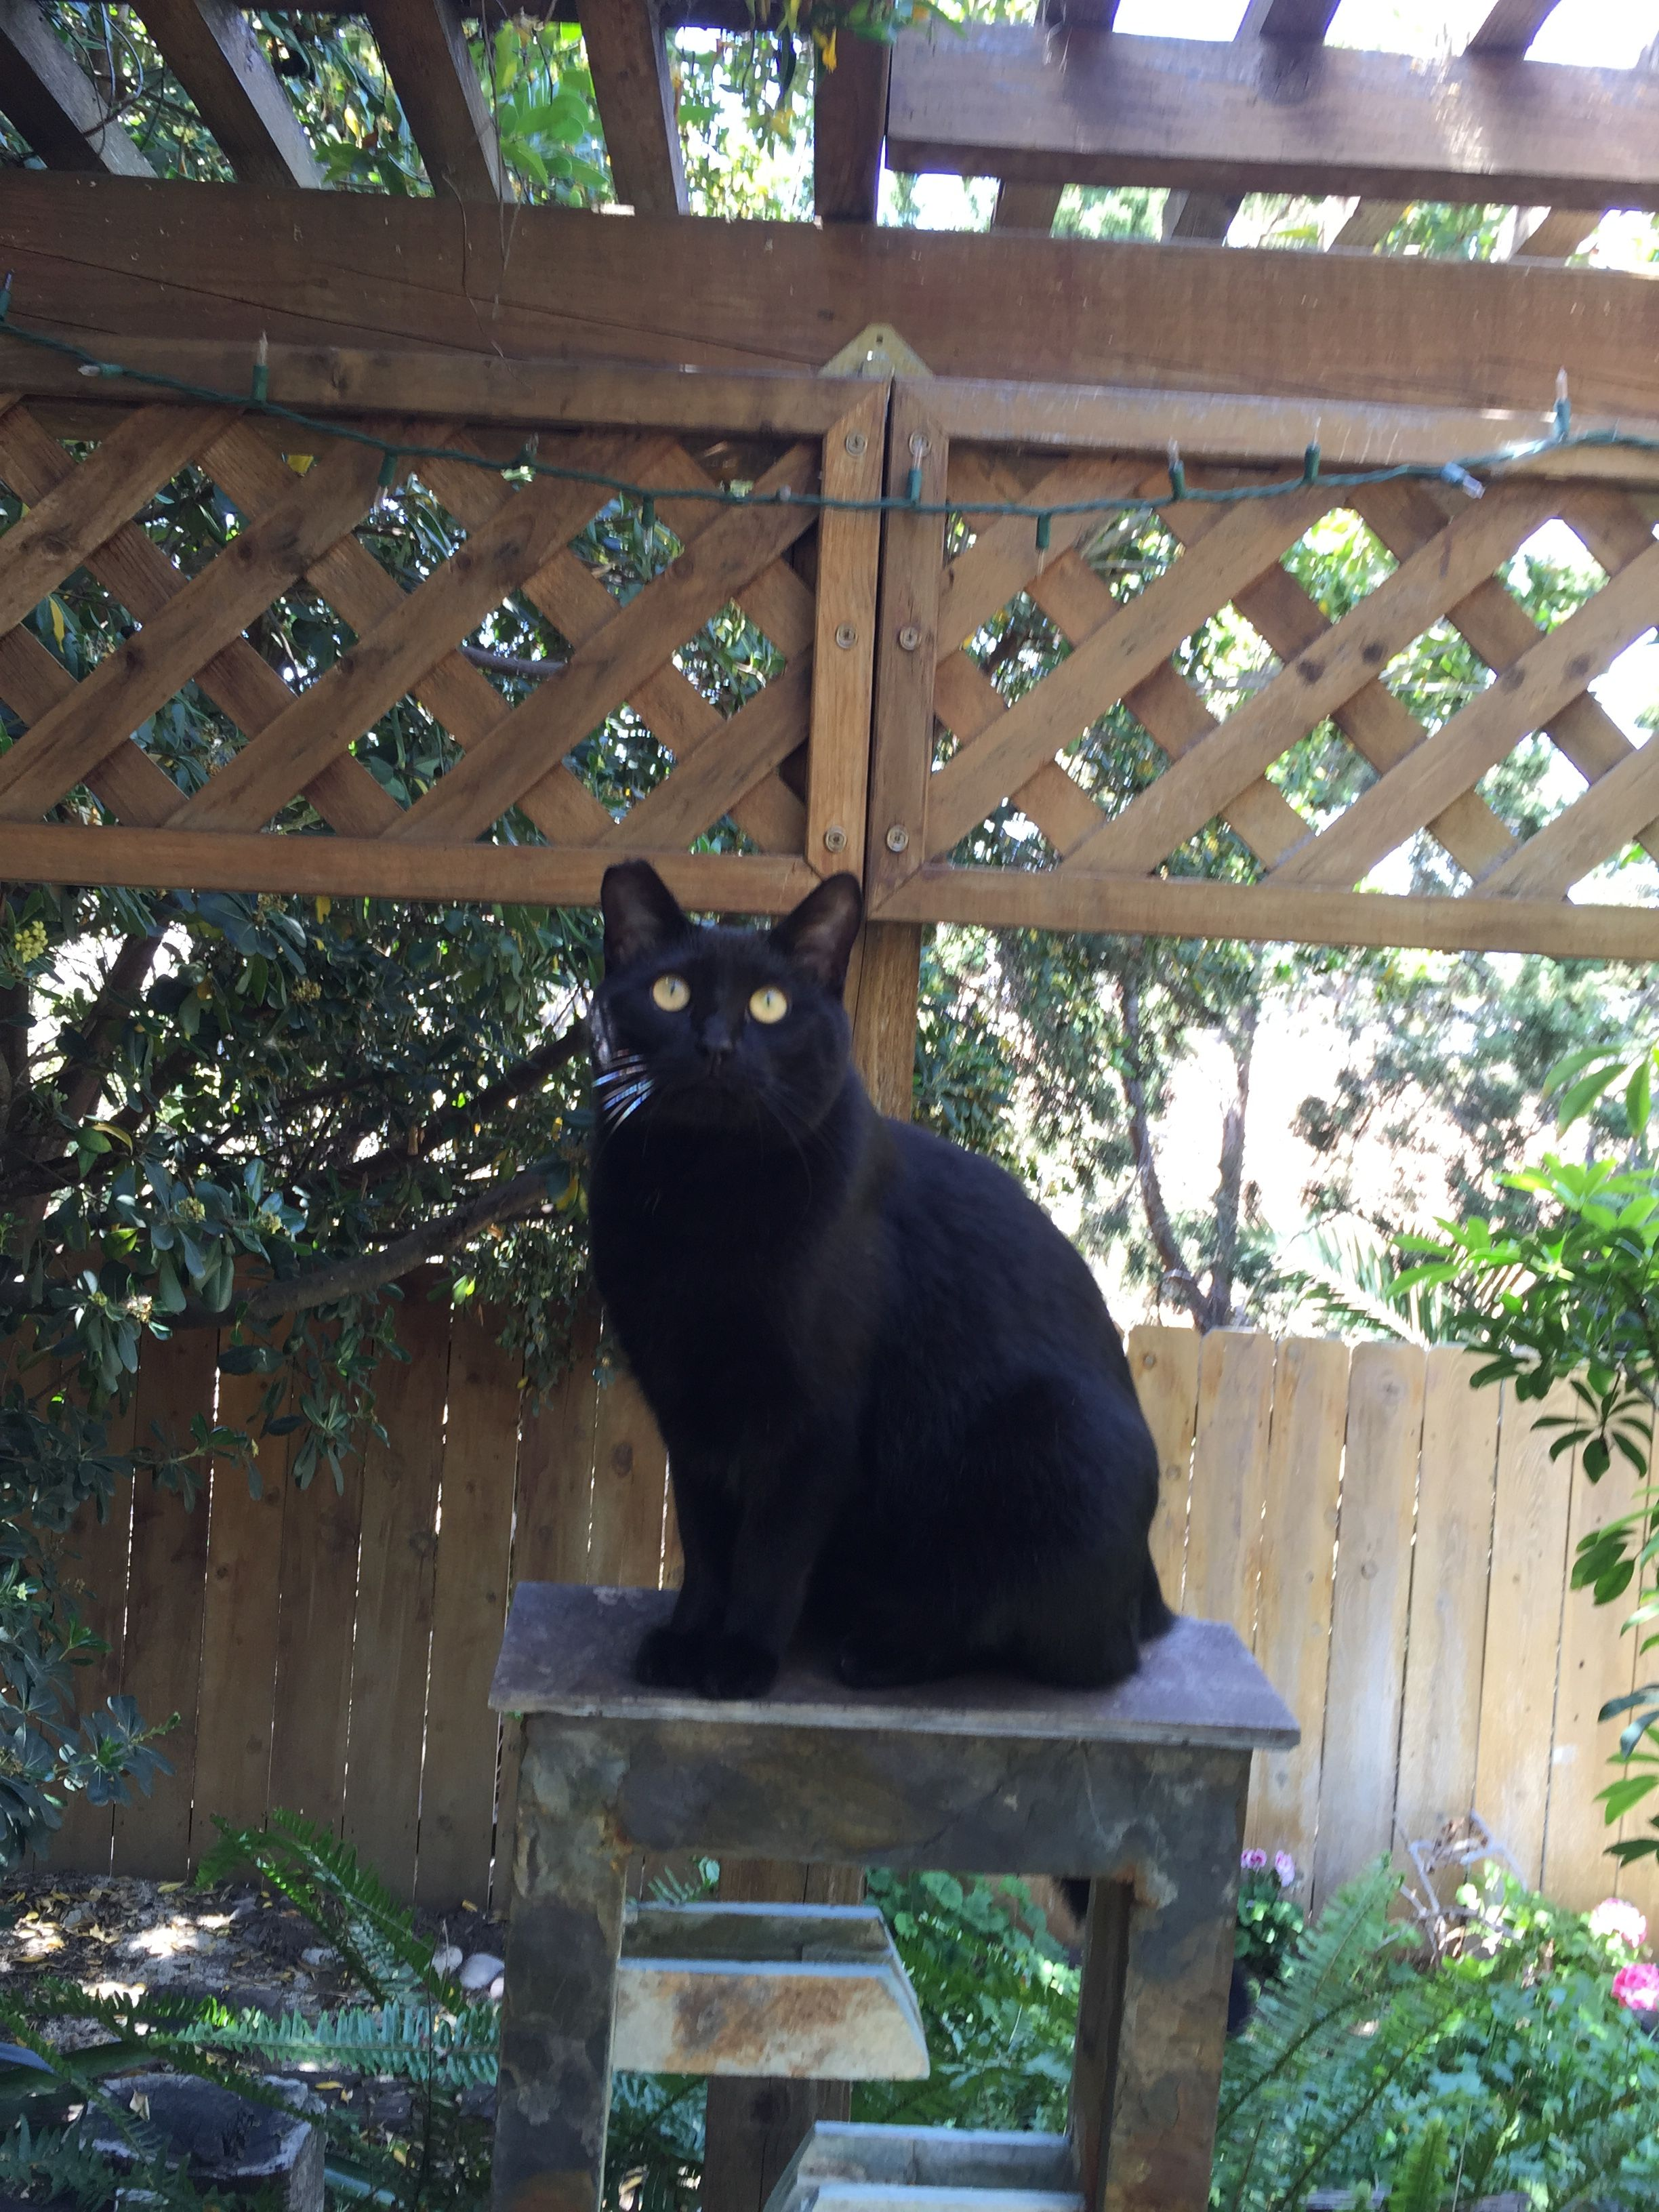 midget Kitty black